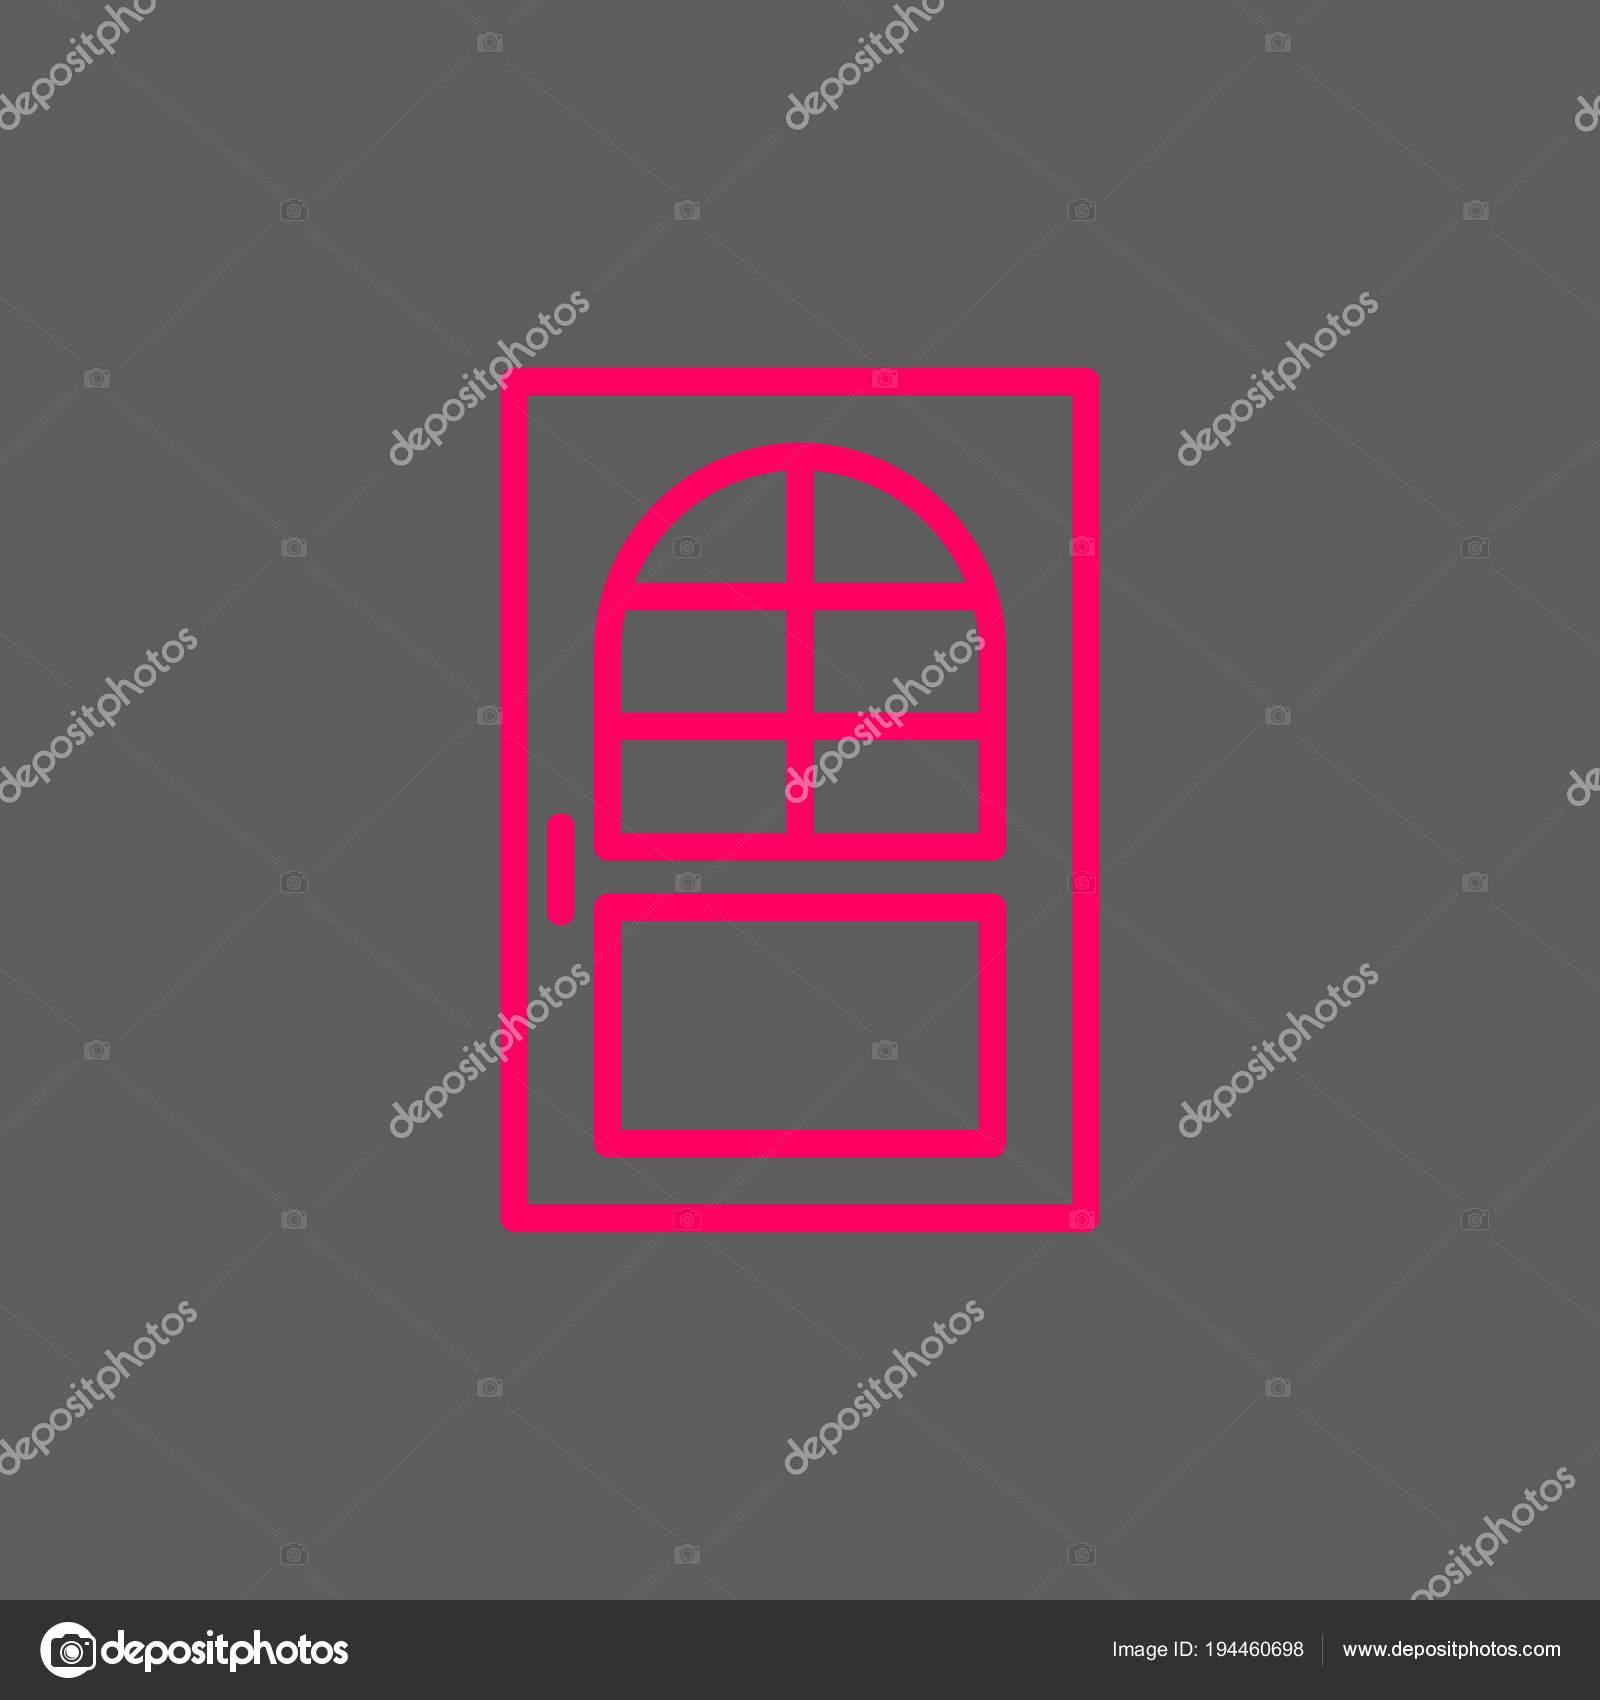 tür farbe web symbol vektor illustration — stockvektor © mr.webicon